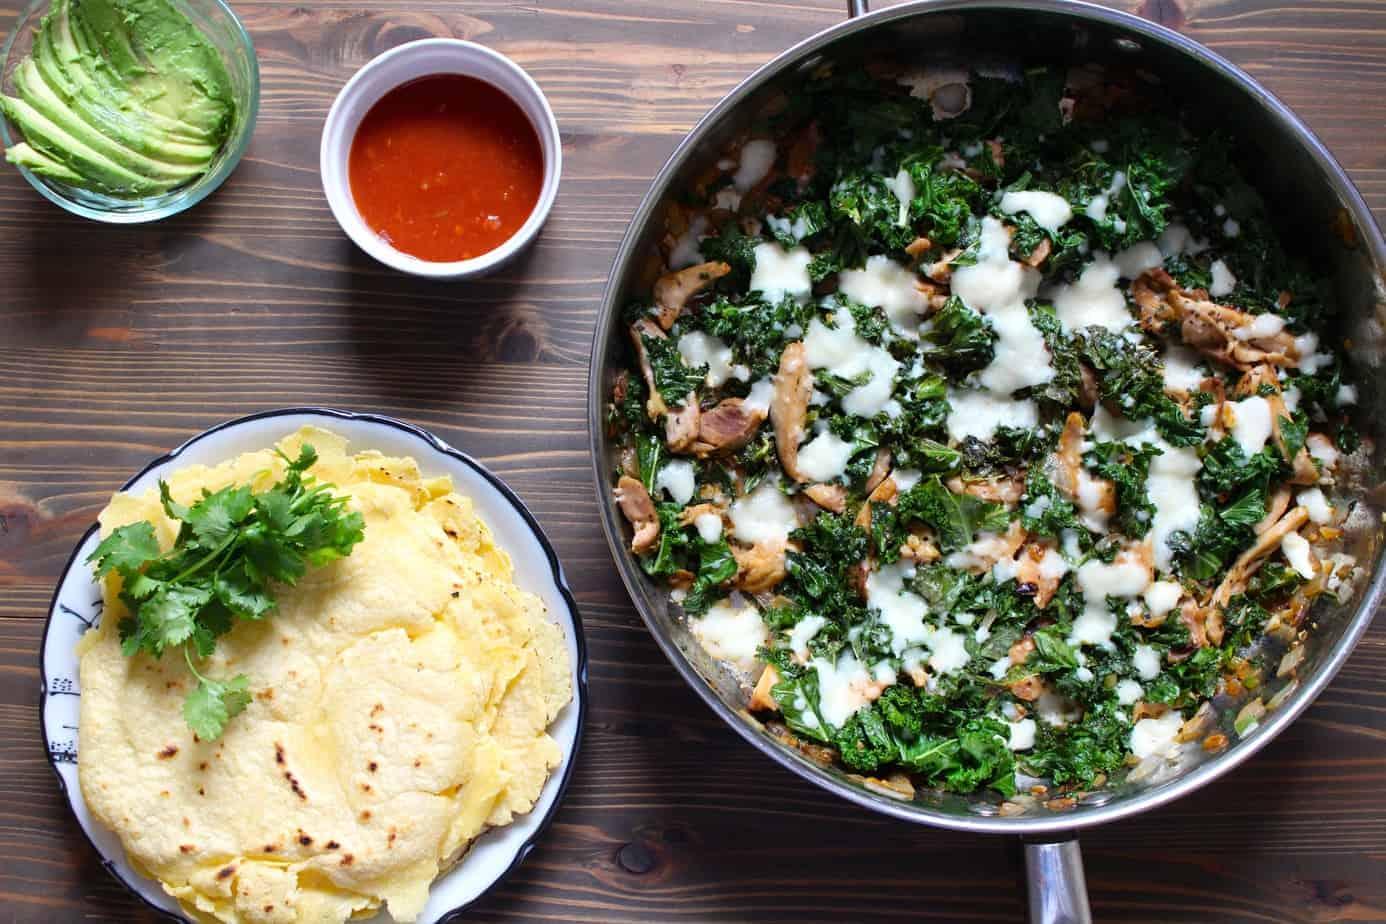 Jalapeño Chicken Skillet - Easy 20 minute entree | Frugal Nutrition